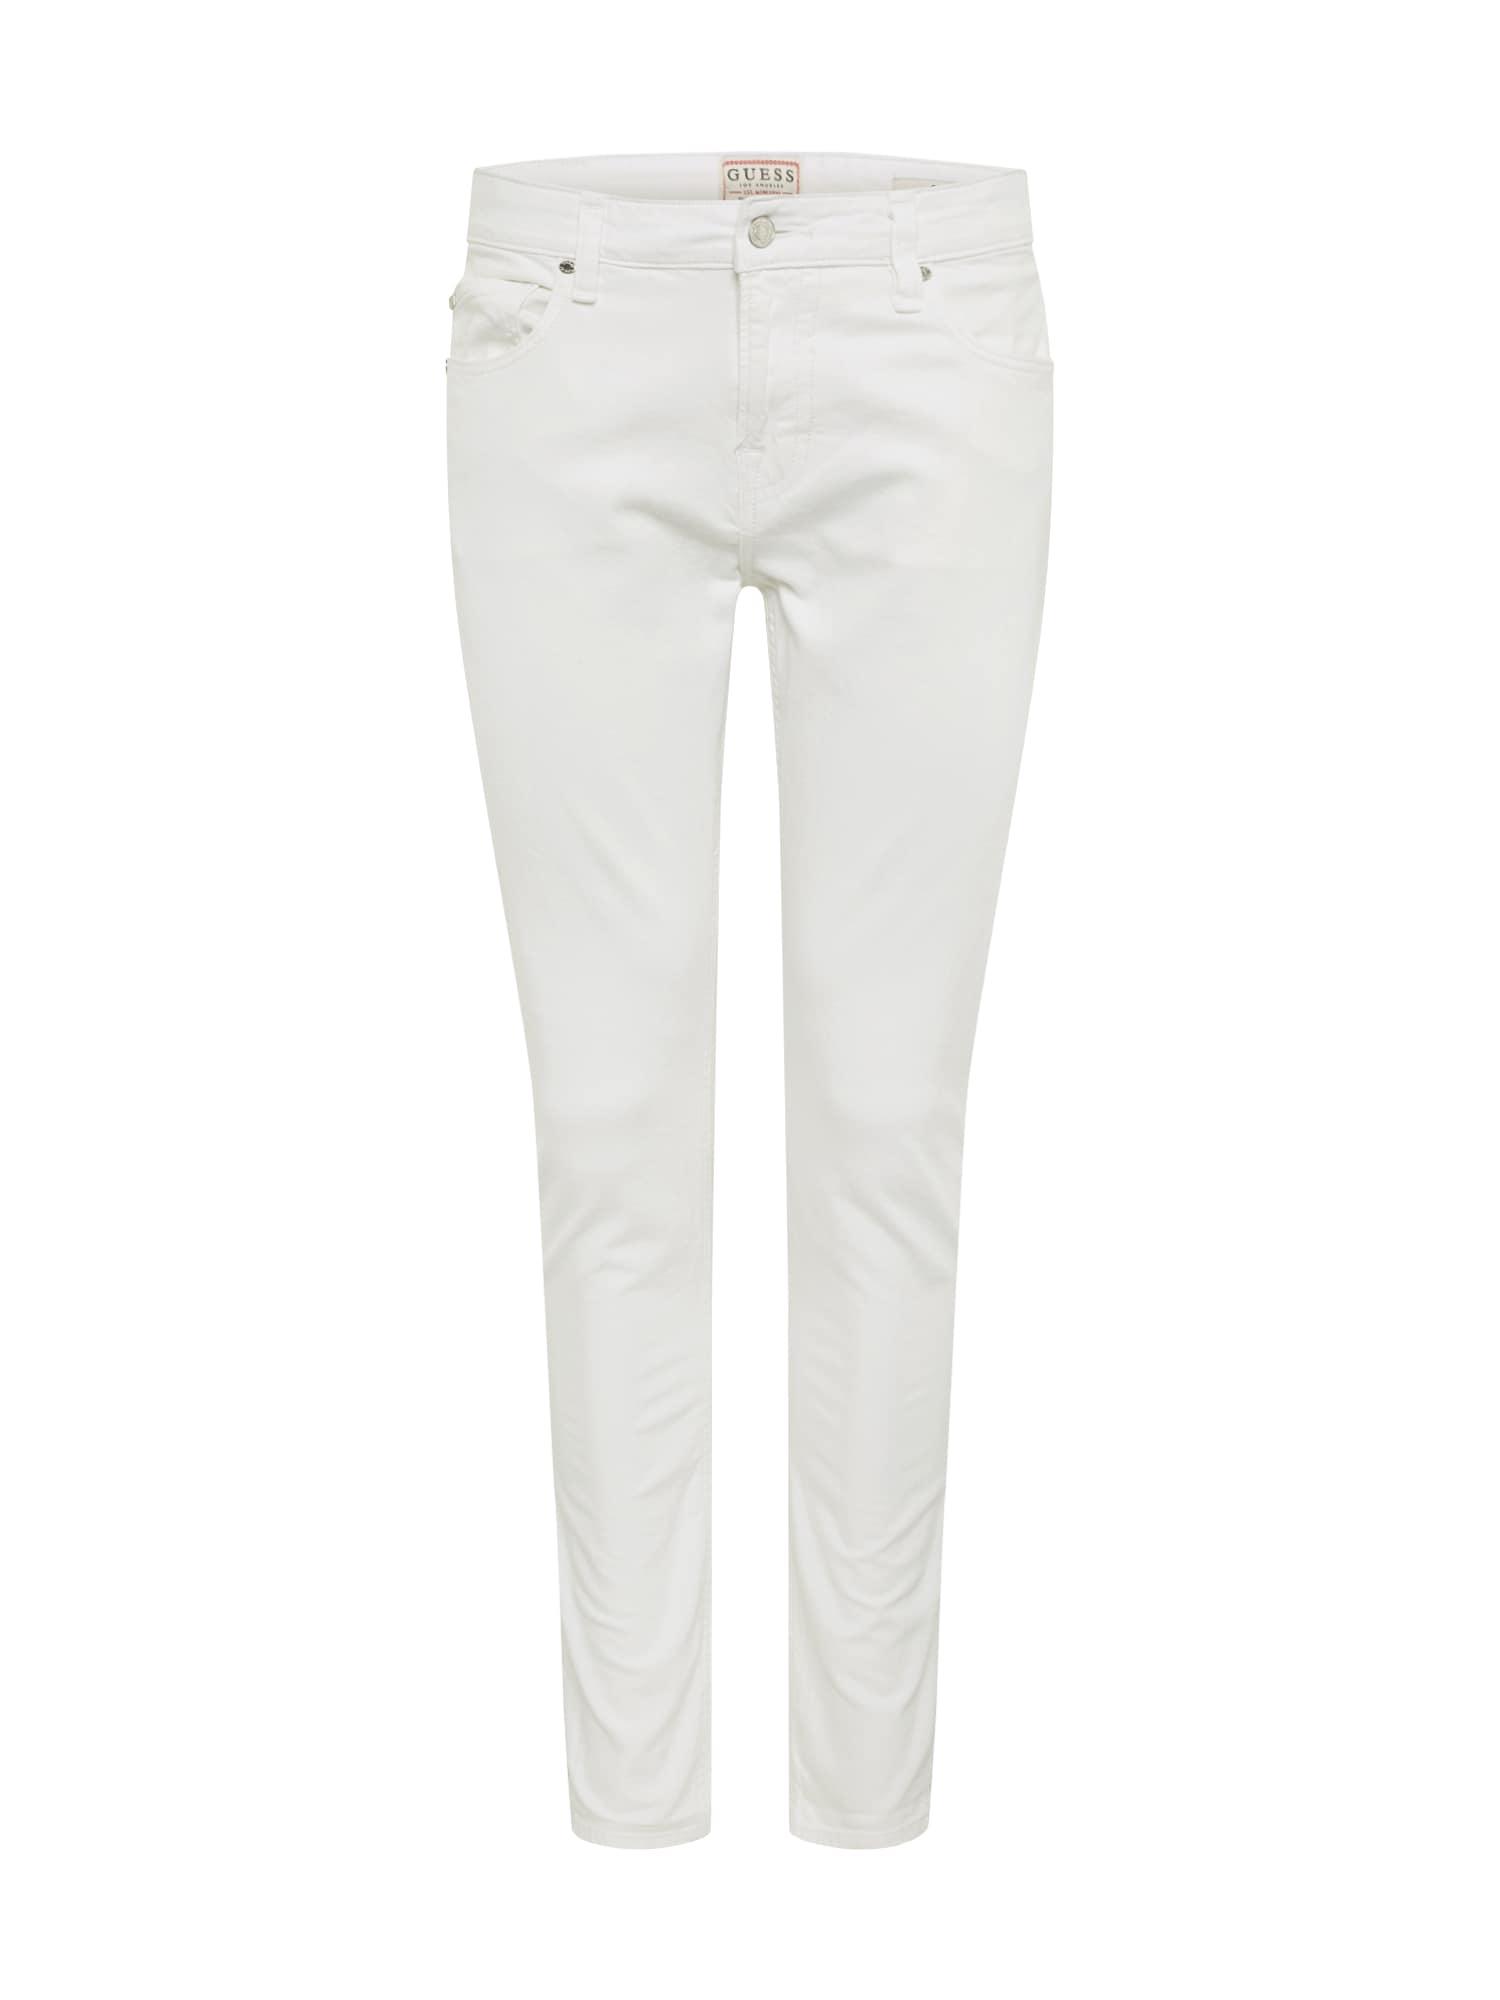 GUESS Džinsai 'CHRIS' balto džinso spalva